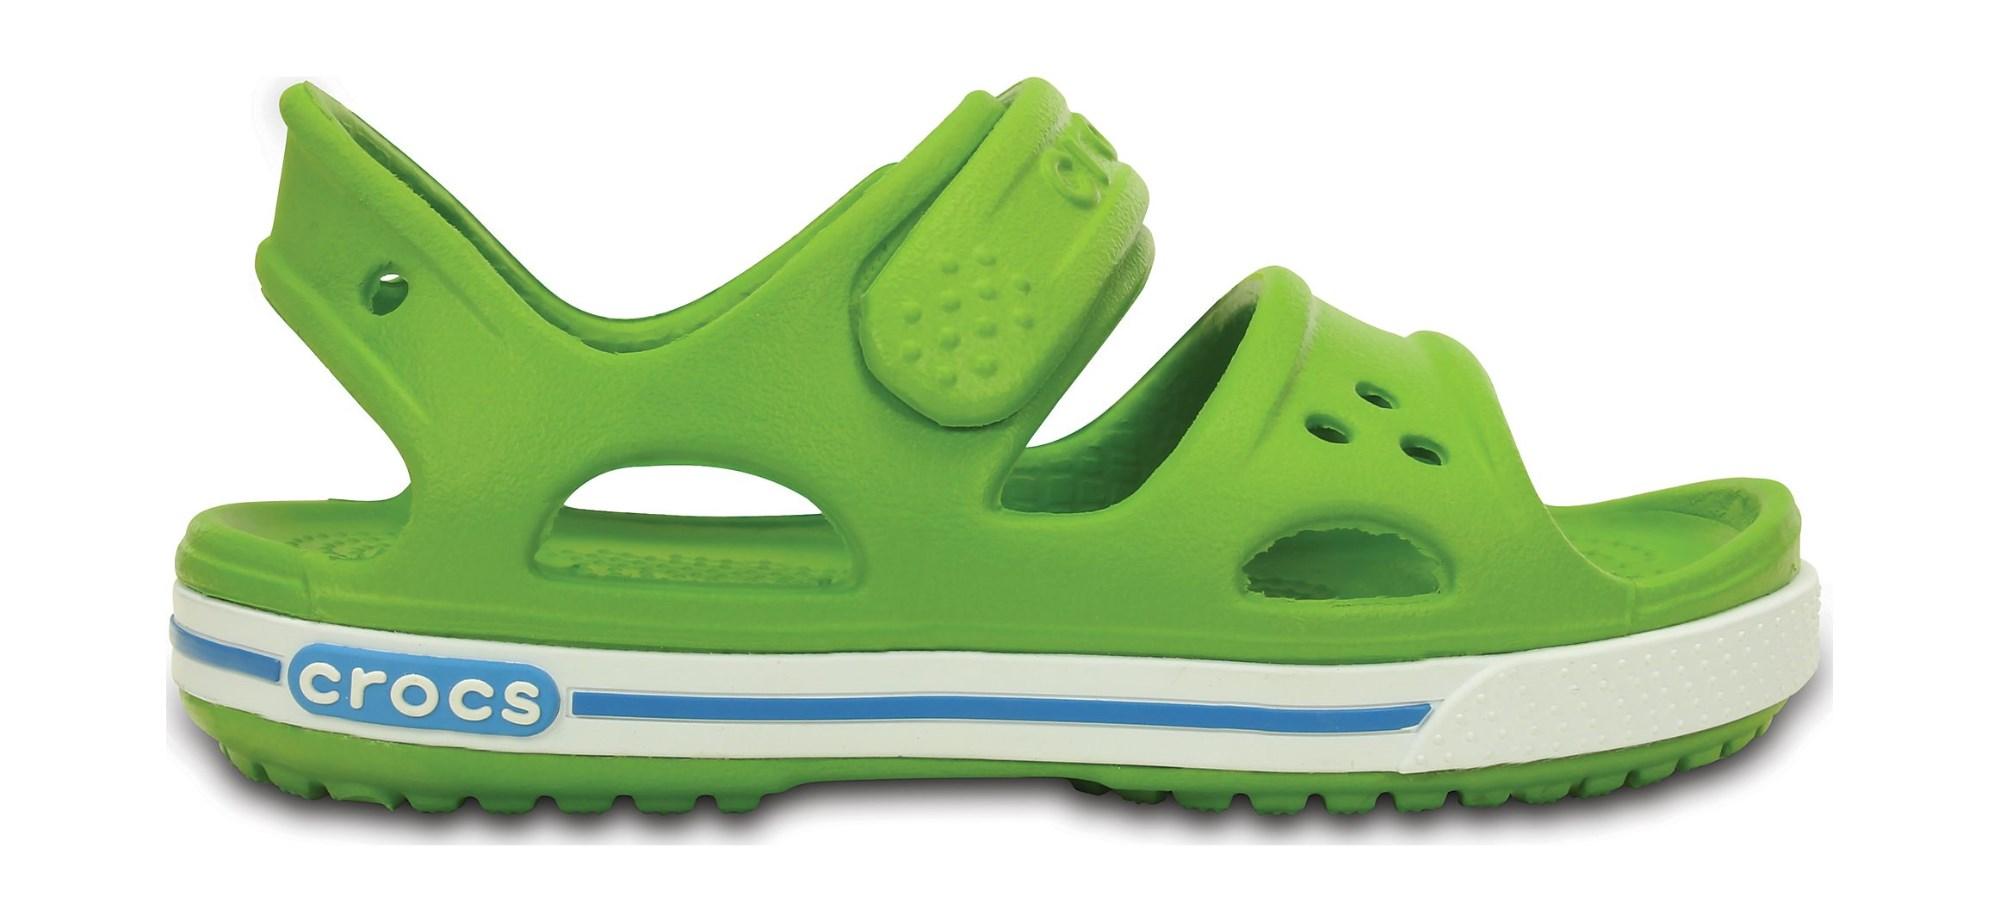 Crocs™ Kids' Crocband II Sandal PS Parrot Green/Ocean 21